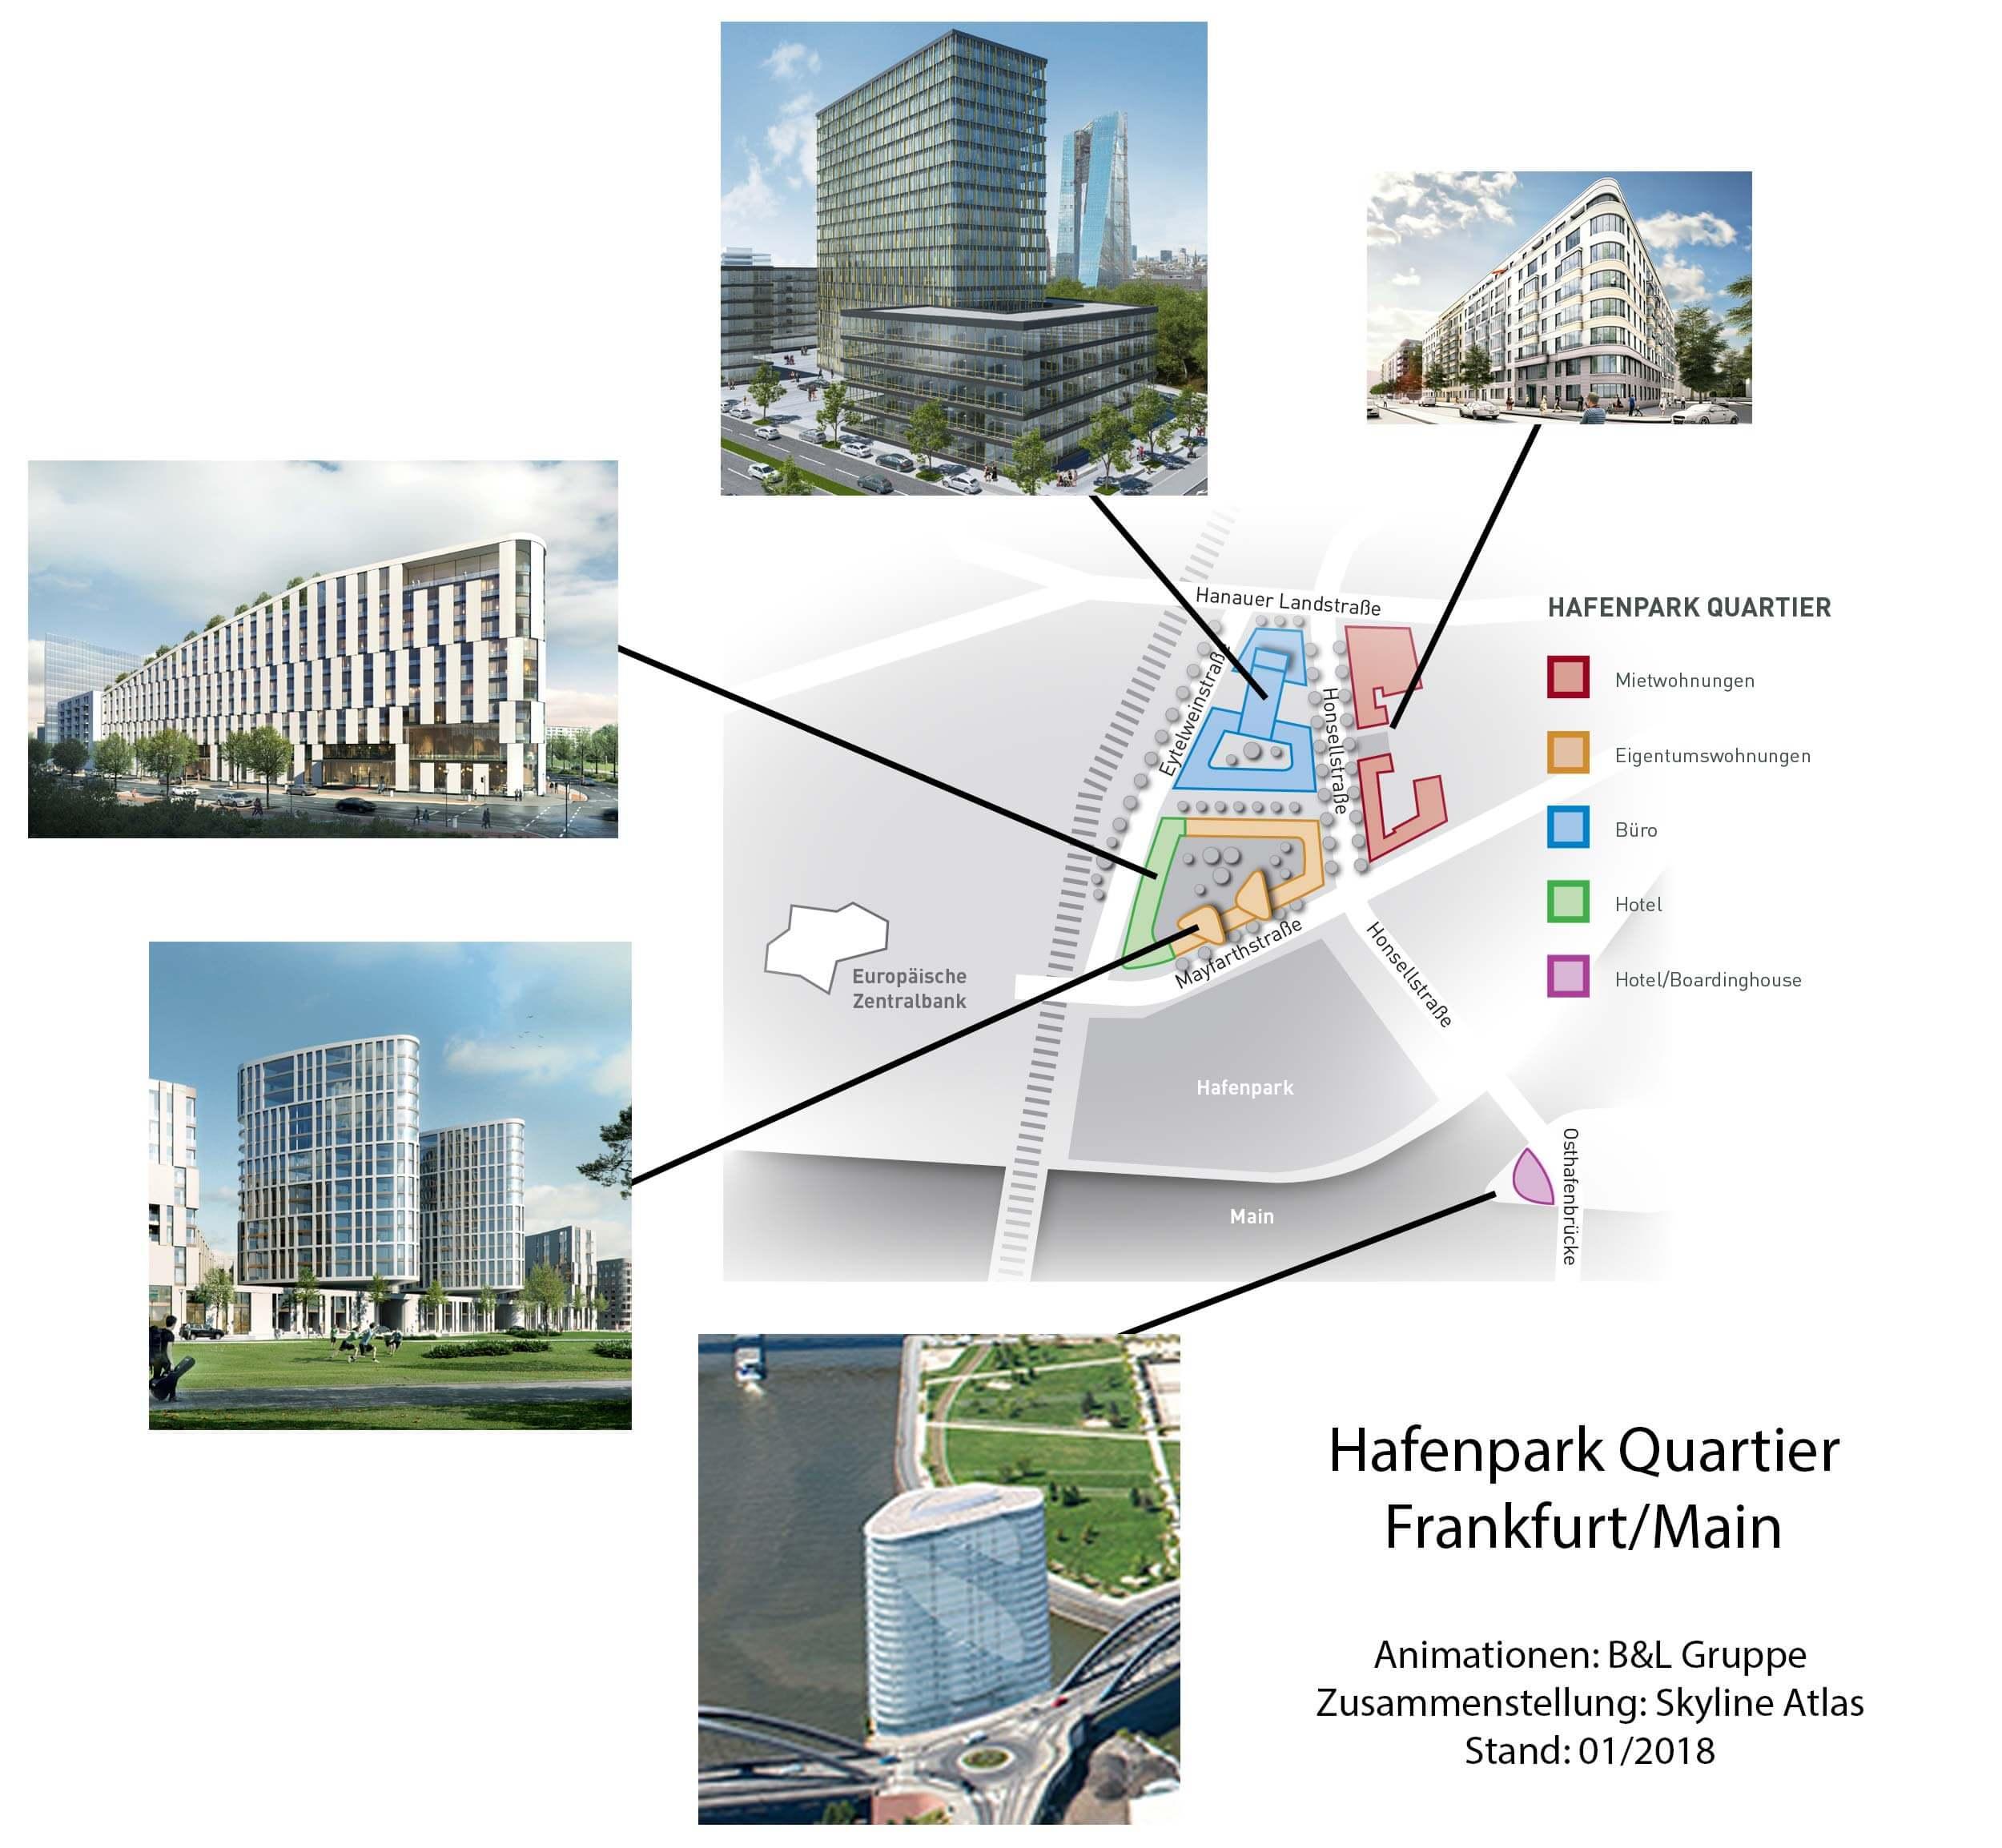 Hafenpark-Quartier in Frankfurt am Main